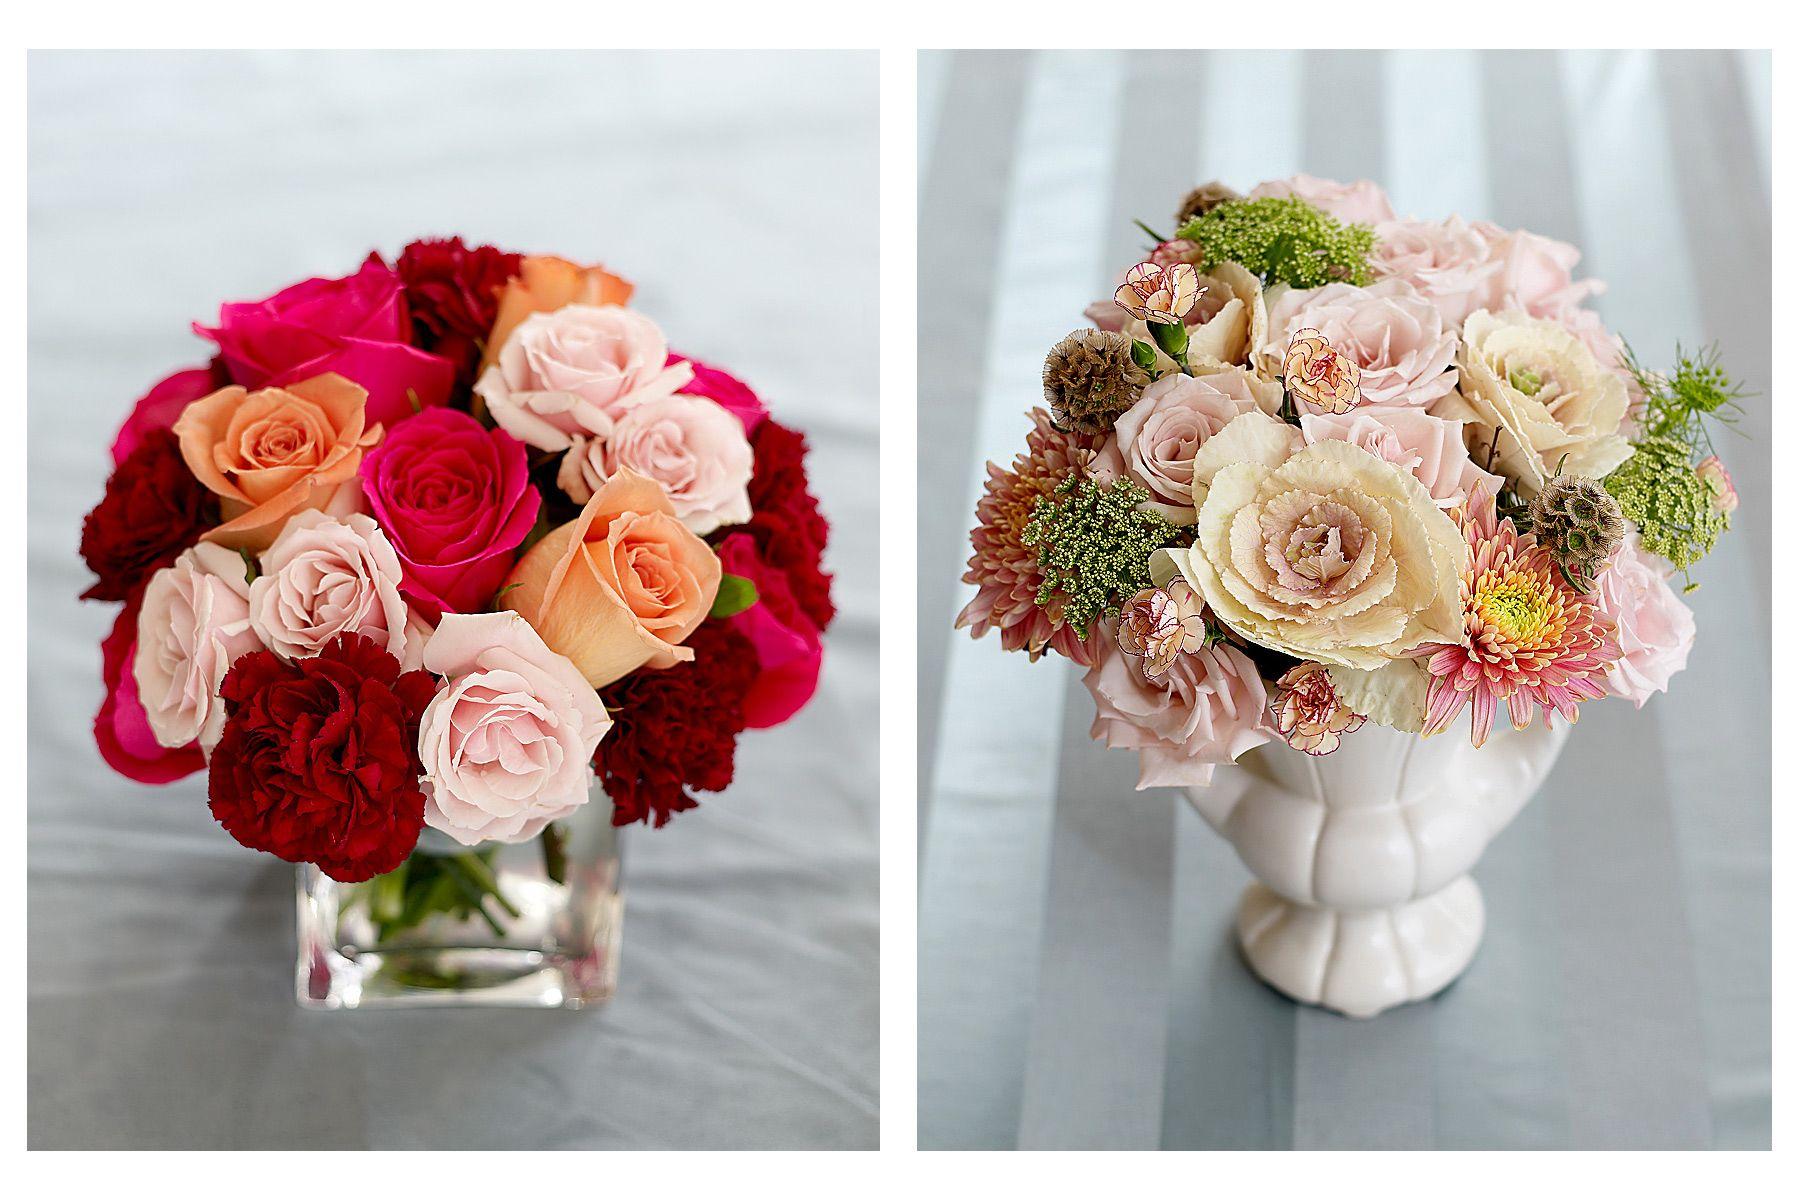 Flowers#1-2-Images.jpg